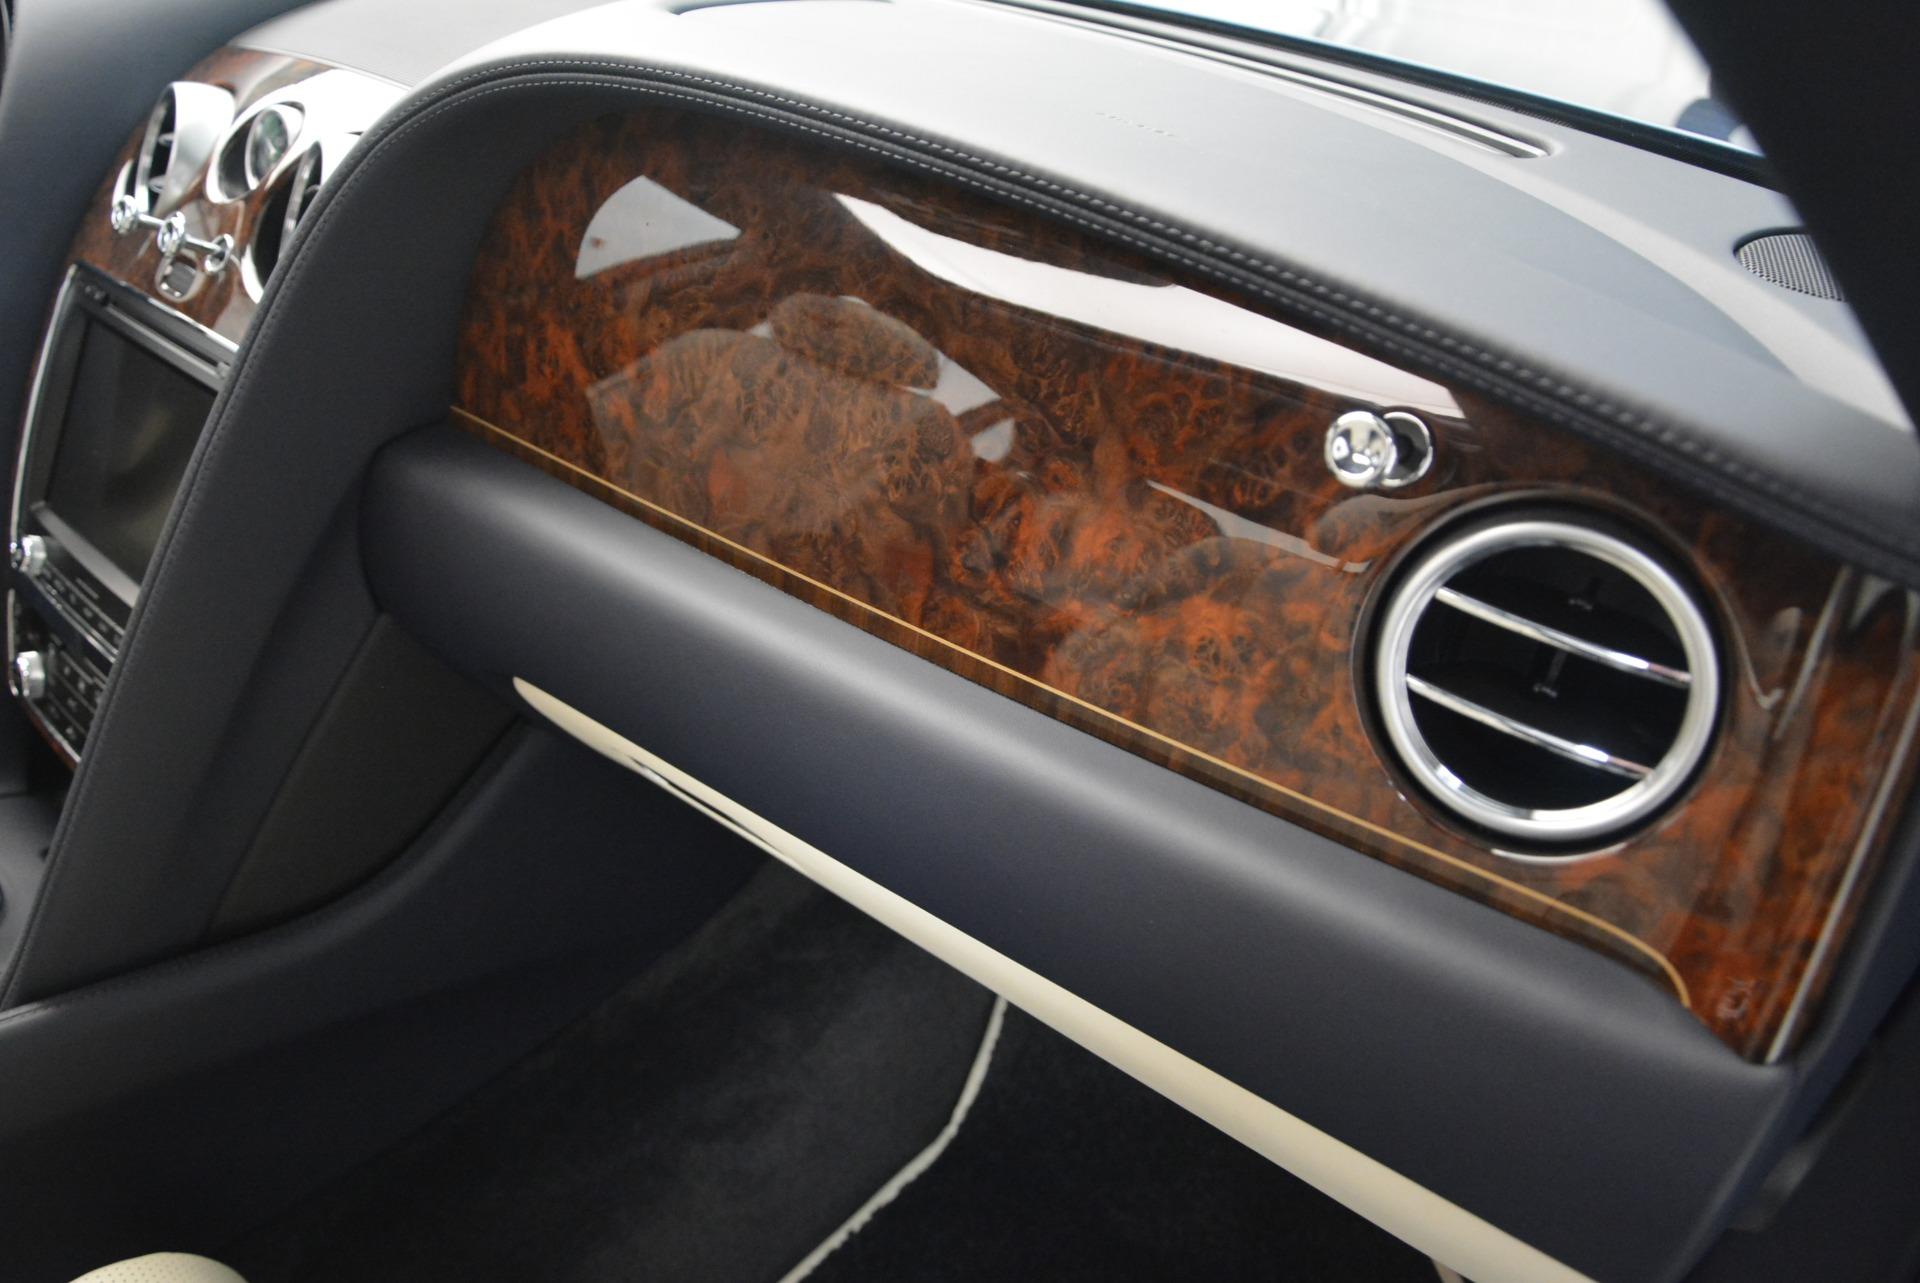 Used 2015 Bentley Flying Spur W12 For Sale In Westport, CT 2339_p25